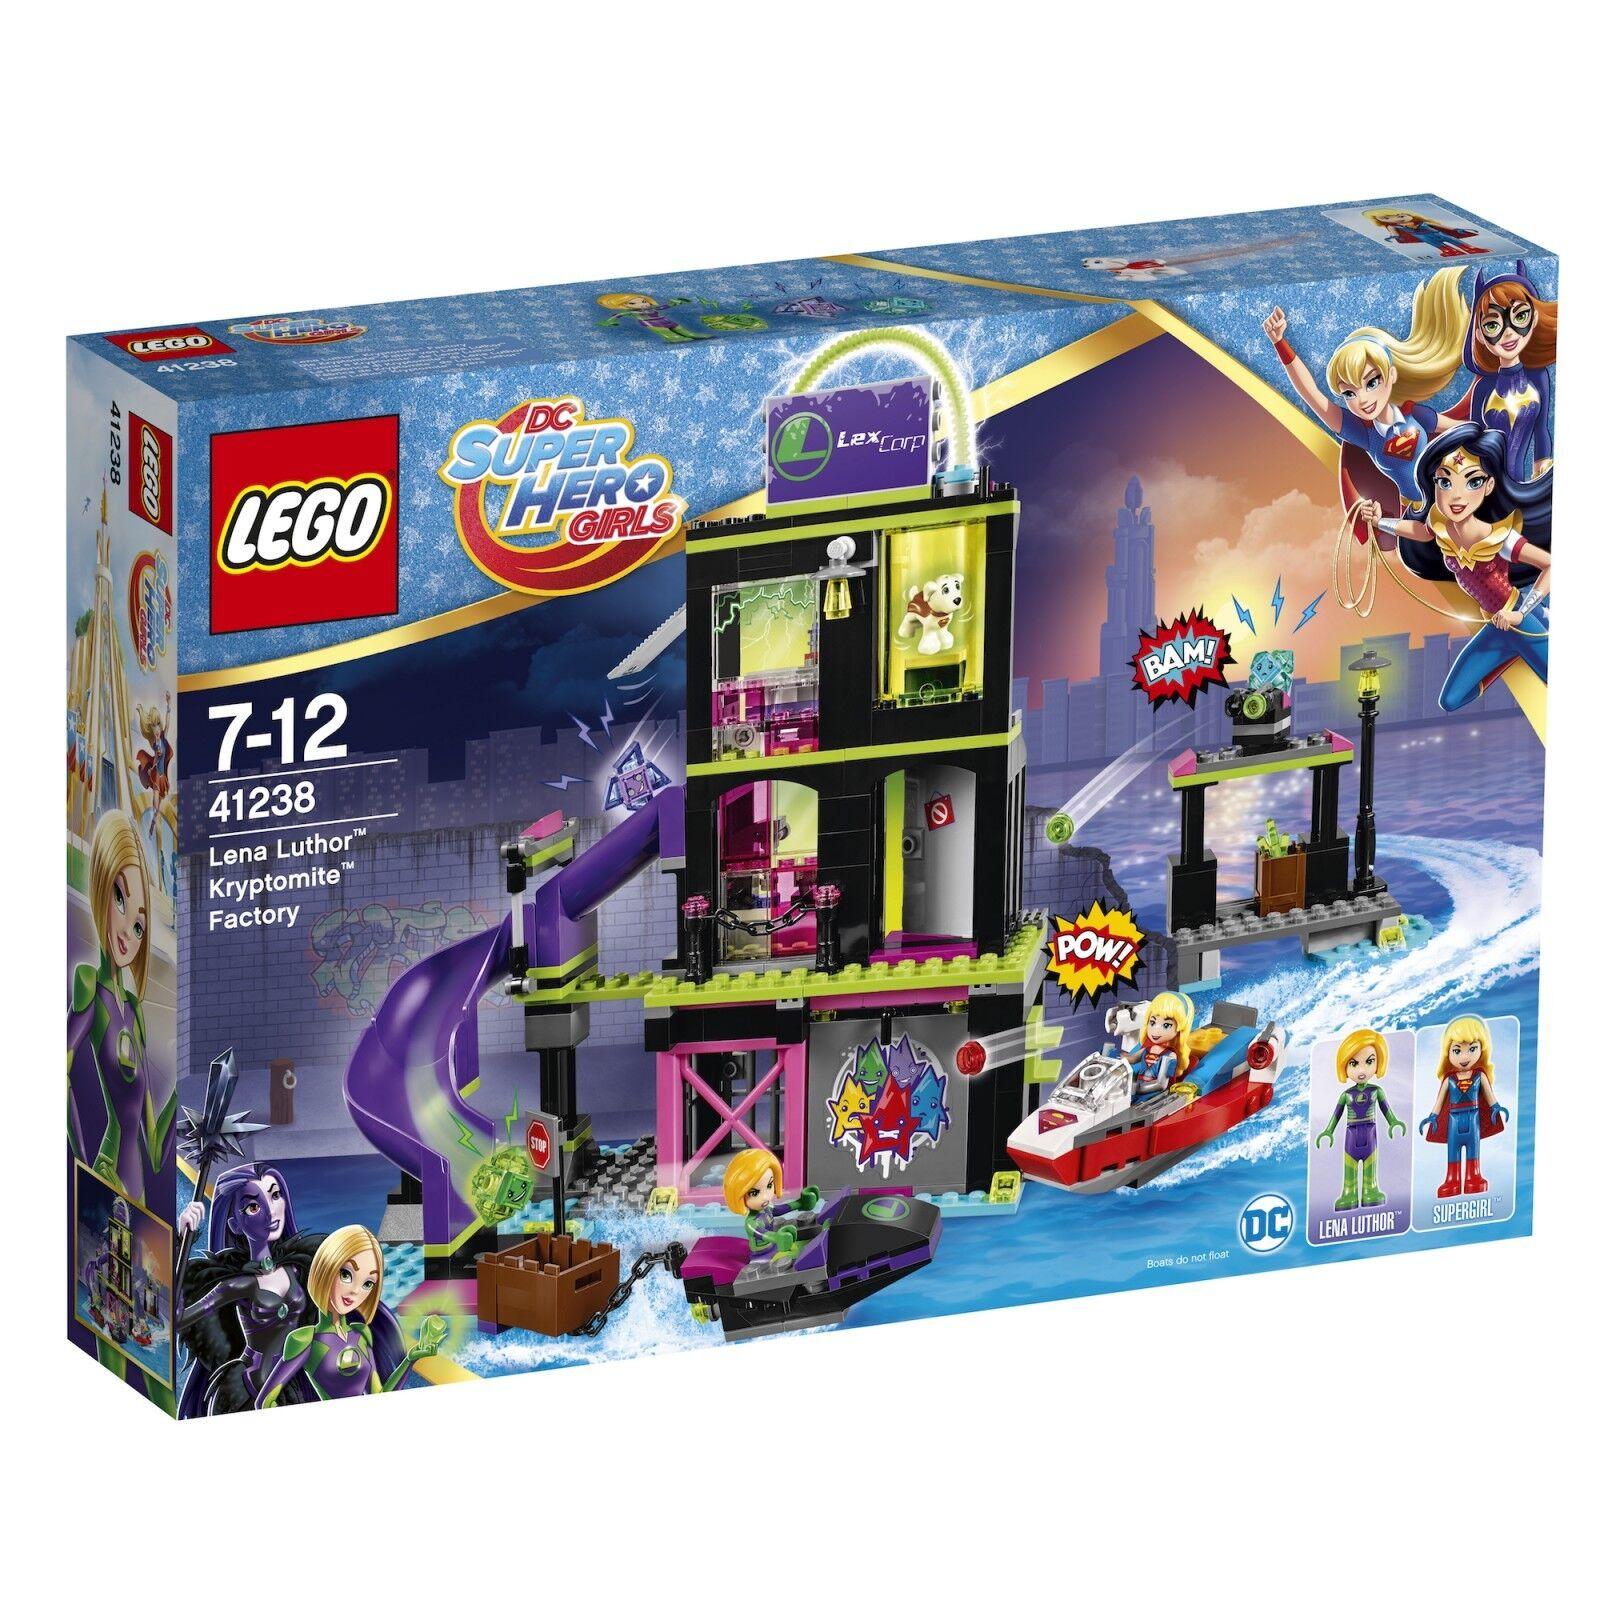 LEGO ® DC Super Hero Girls ™ 41238 la kryptomite ™ - fabbrica di Lena Luthor ™ NUOVO NEW